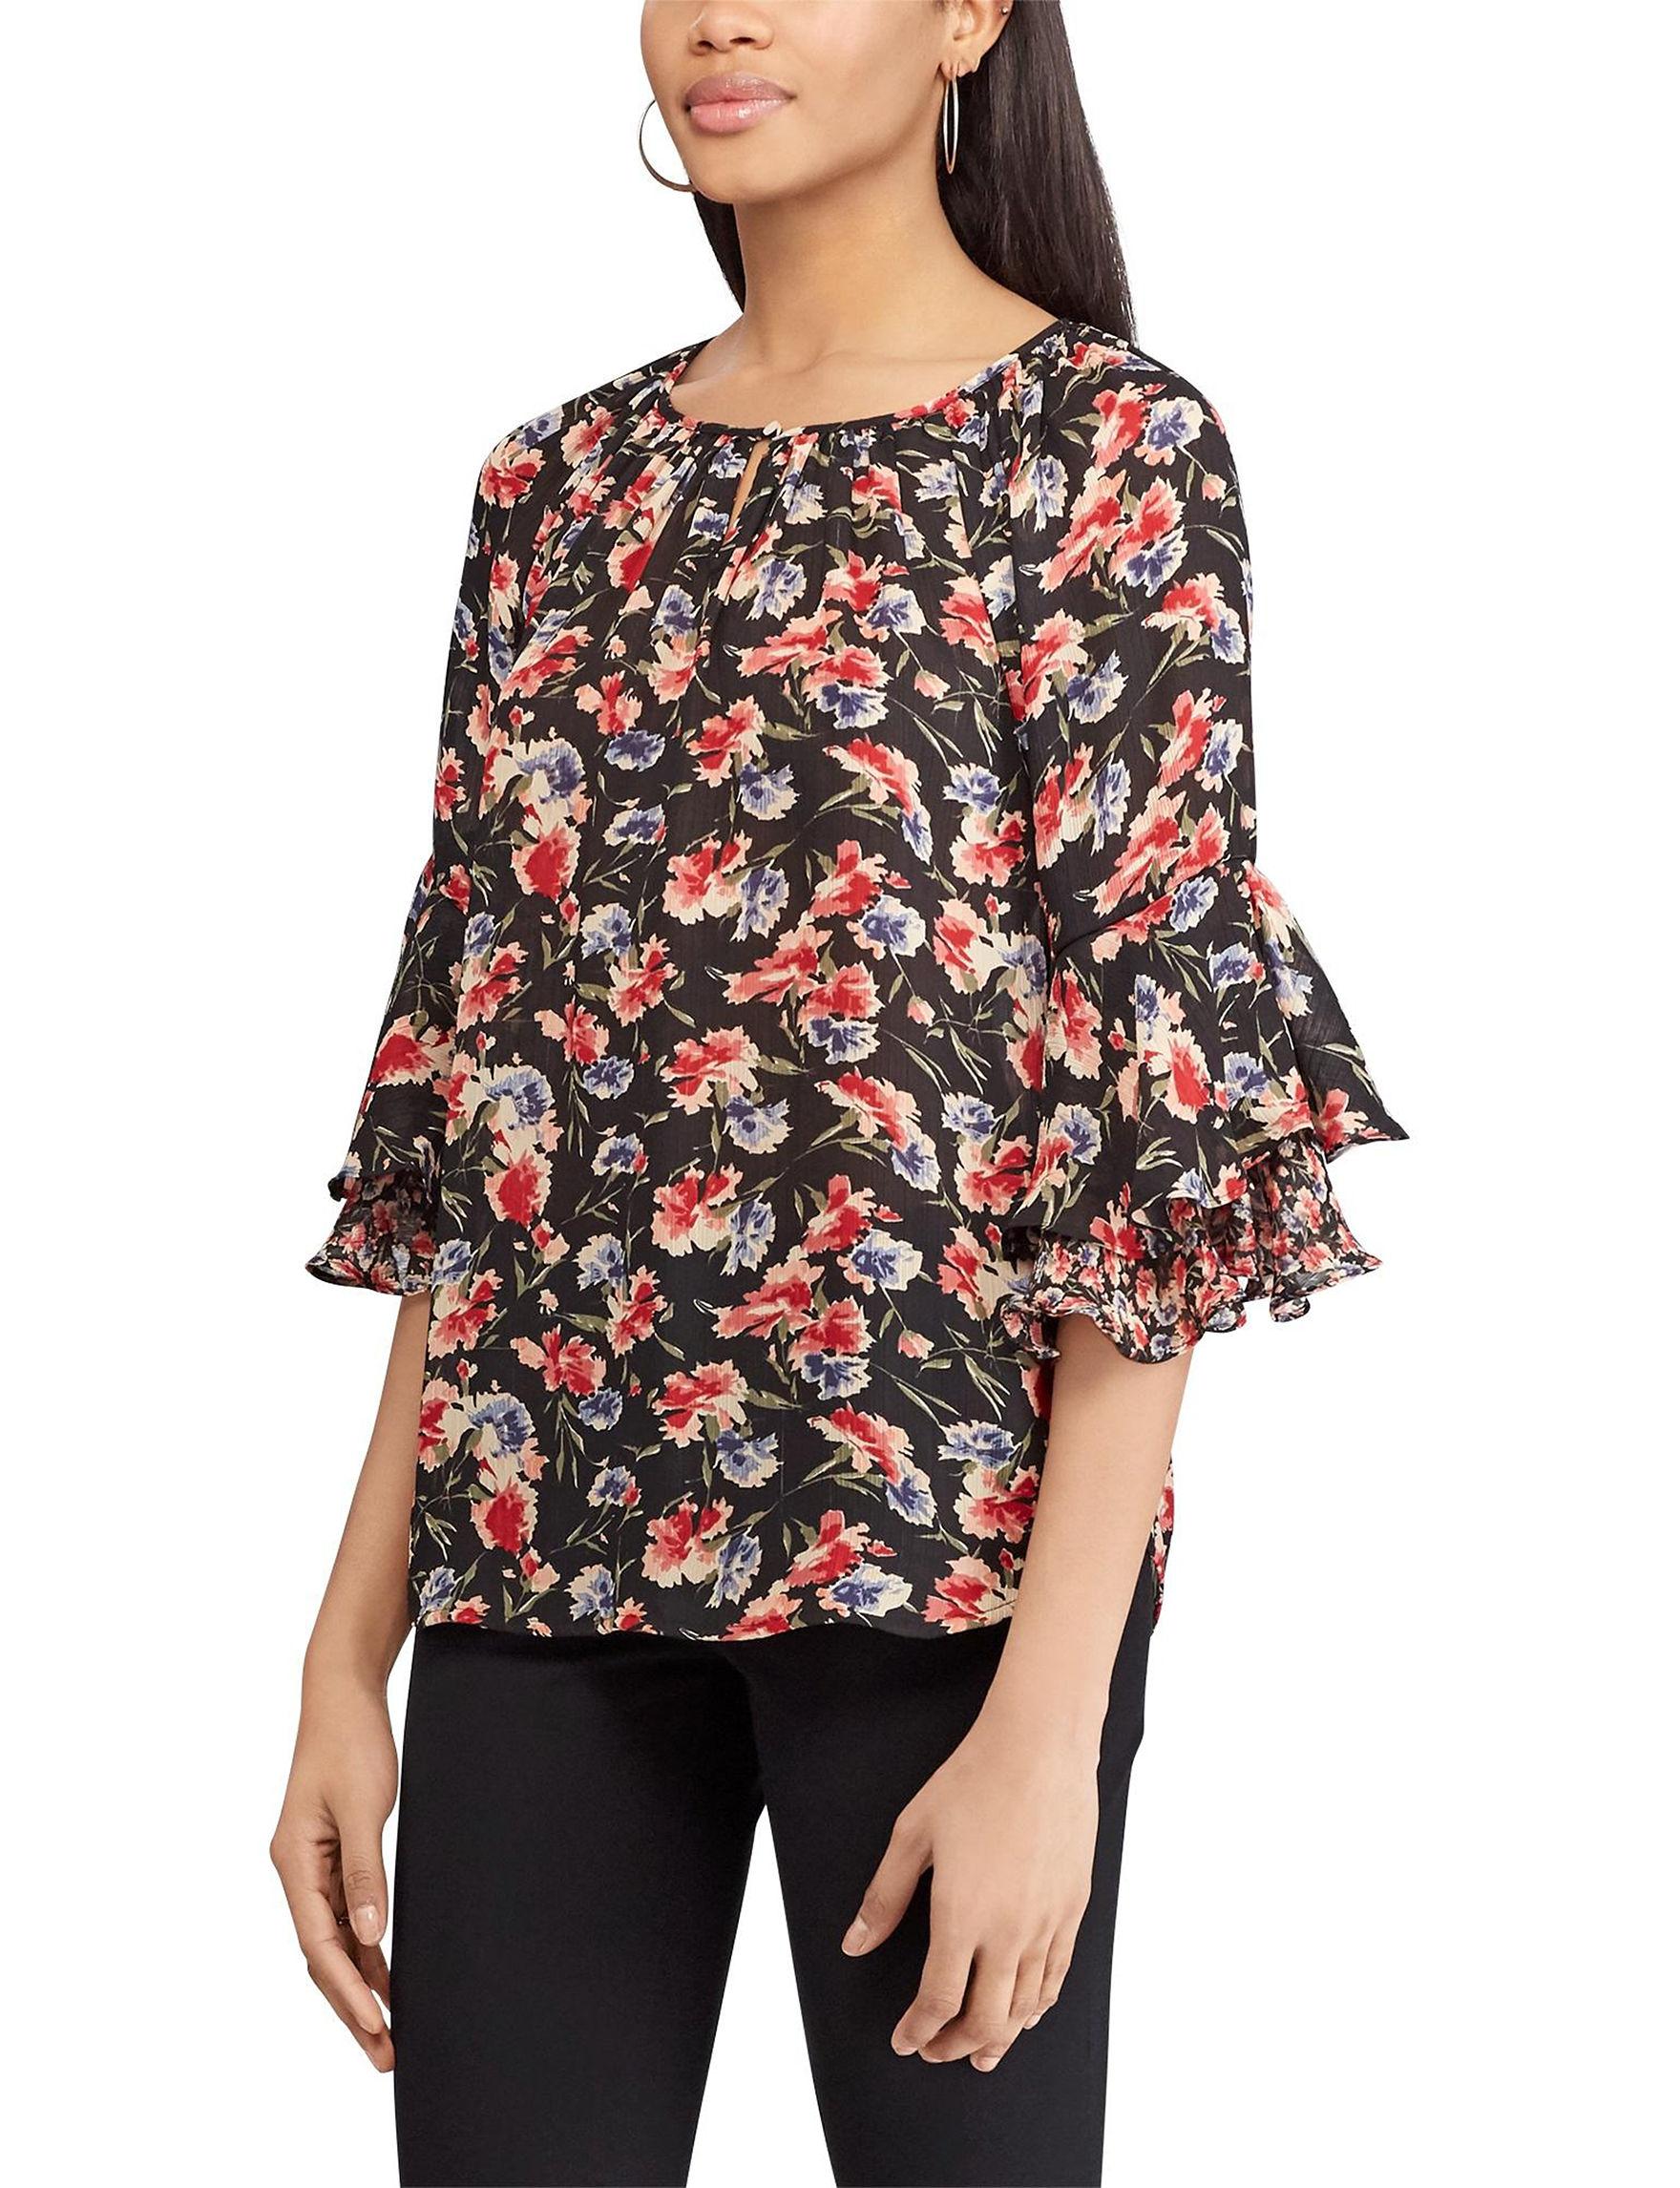 Chaps Black Multi Shirts & Blouses